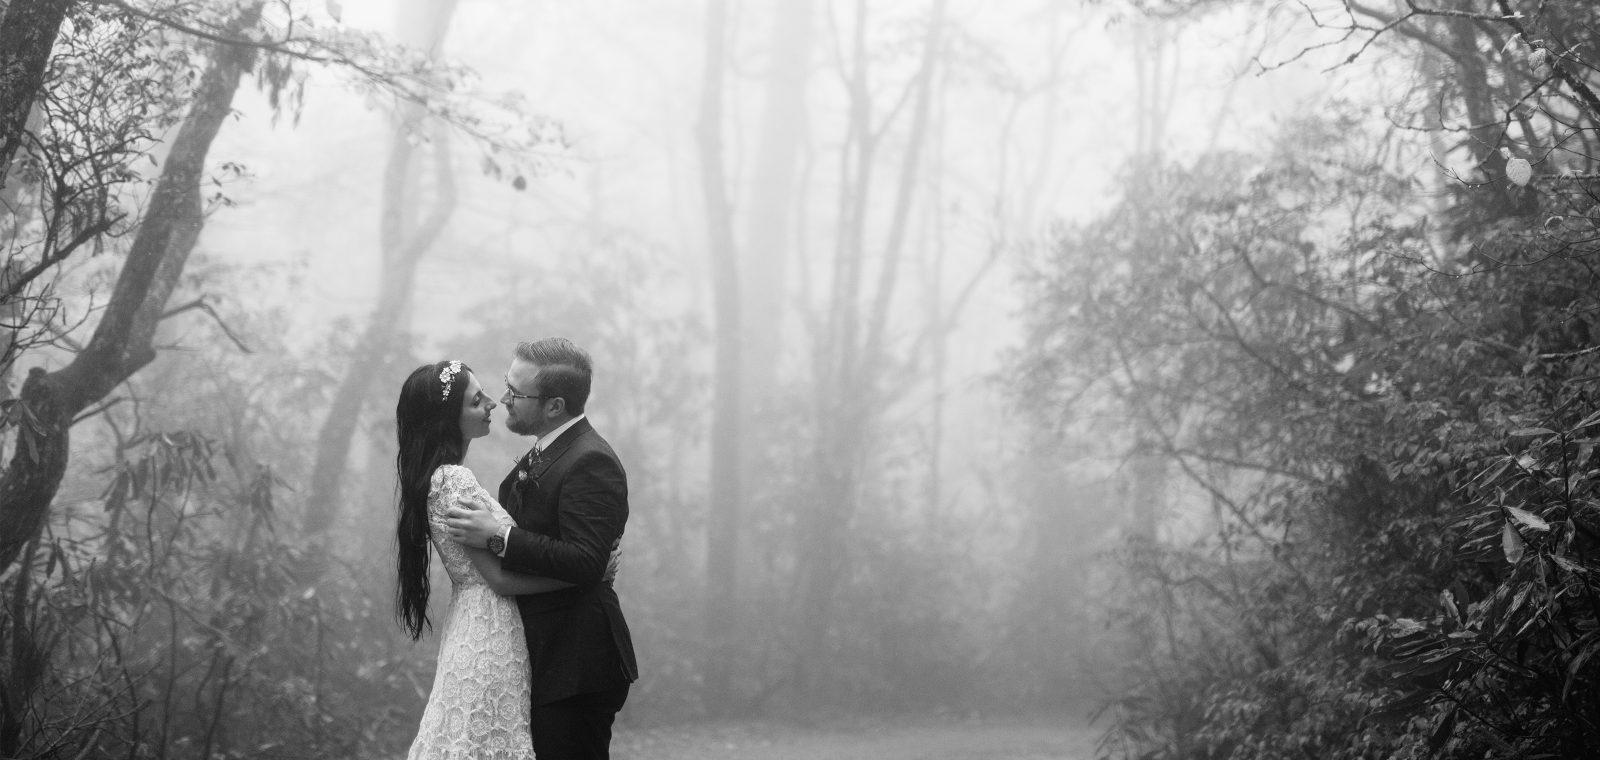 Rainy Highlands North Carolina Wedding